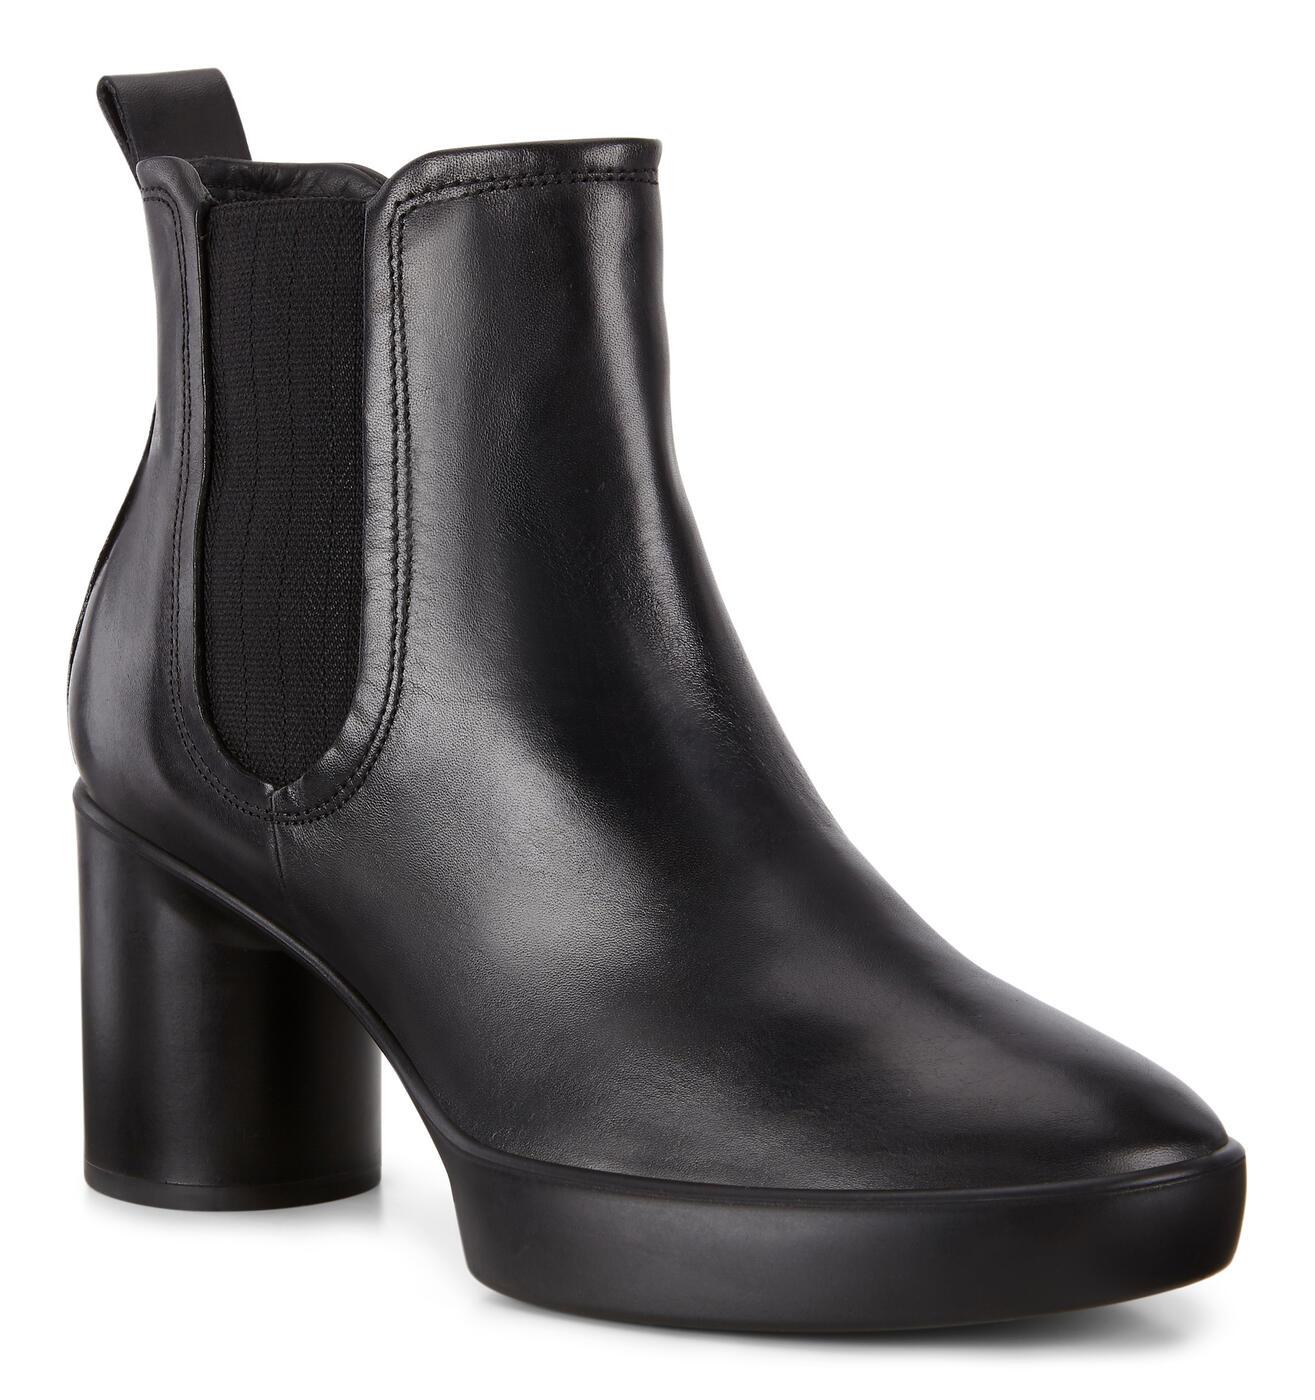 ECCO SHAPE SCULPTED MOTION 55 Women's Chelsea Boot